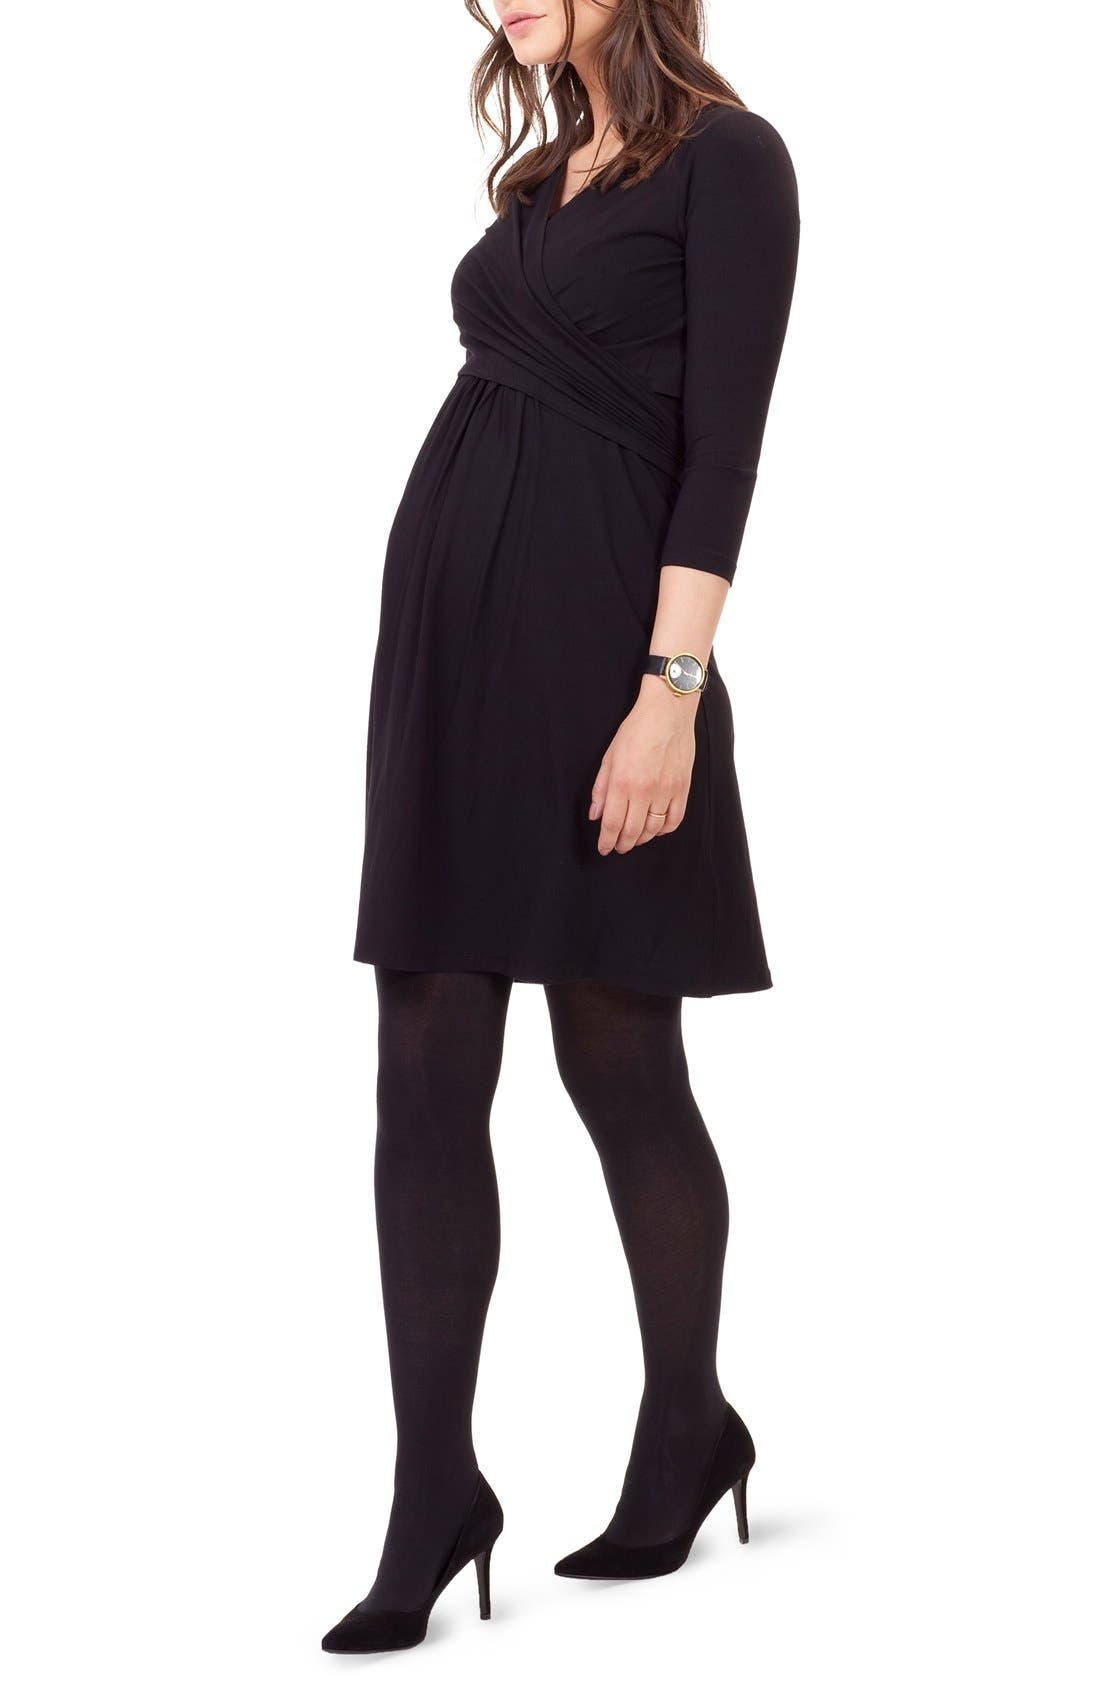 ISABELLA OLIVER,                             'Avebury' Nursing Wrap Maternity Dress,                             Alternate thumbnail 4, color,                             001